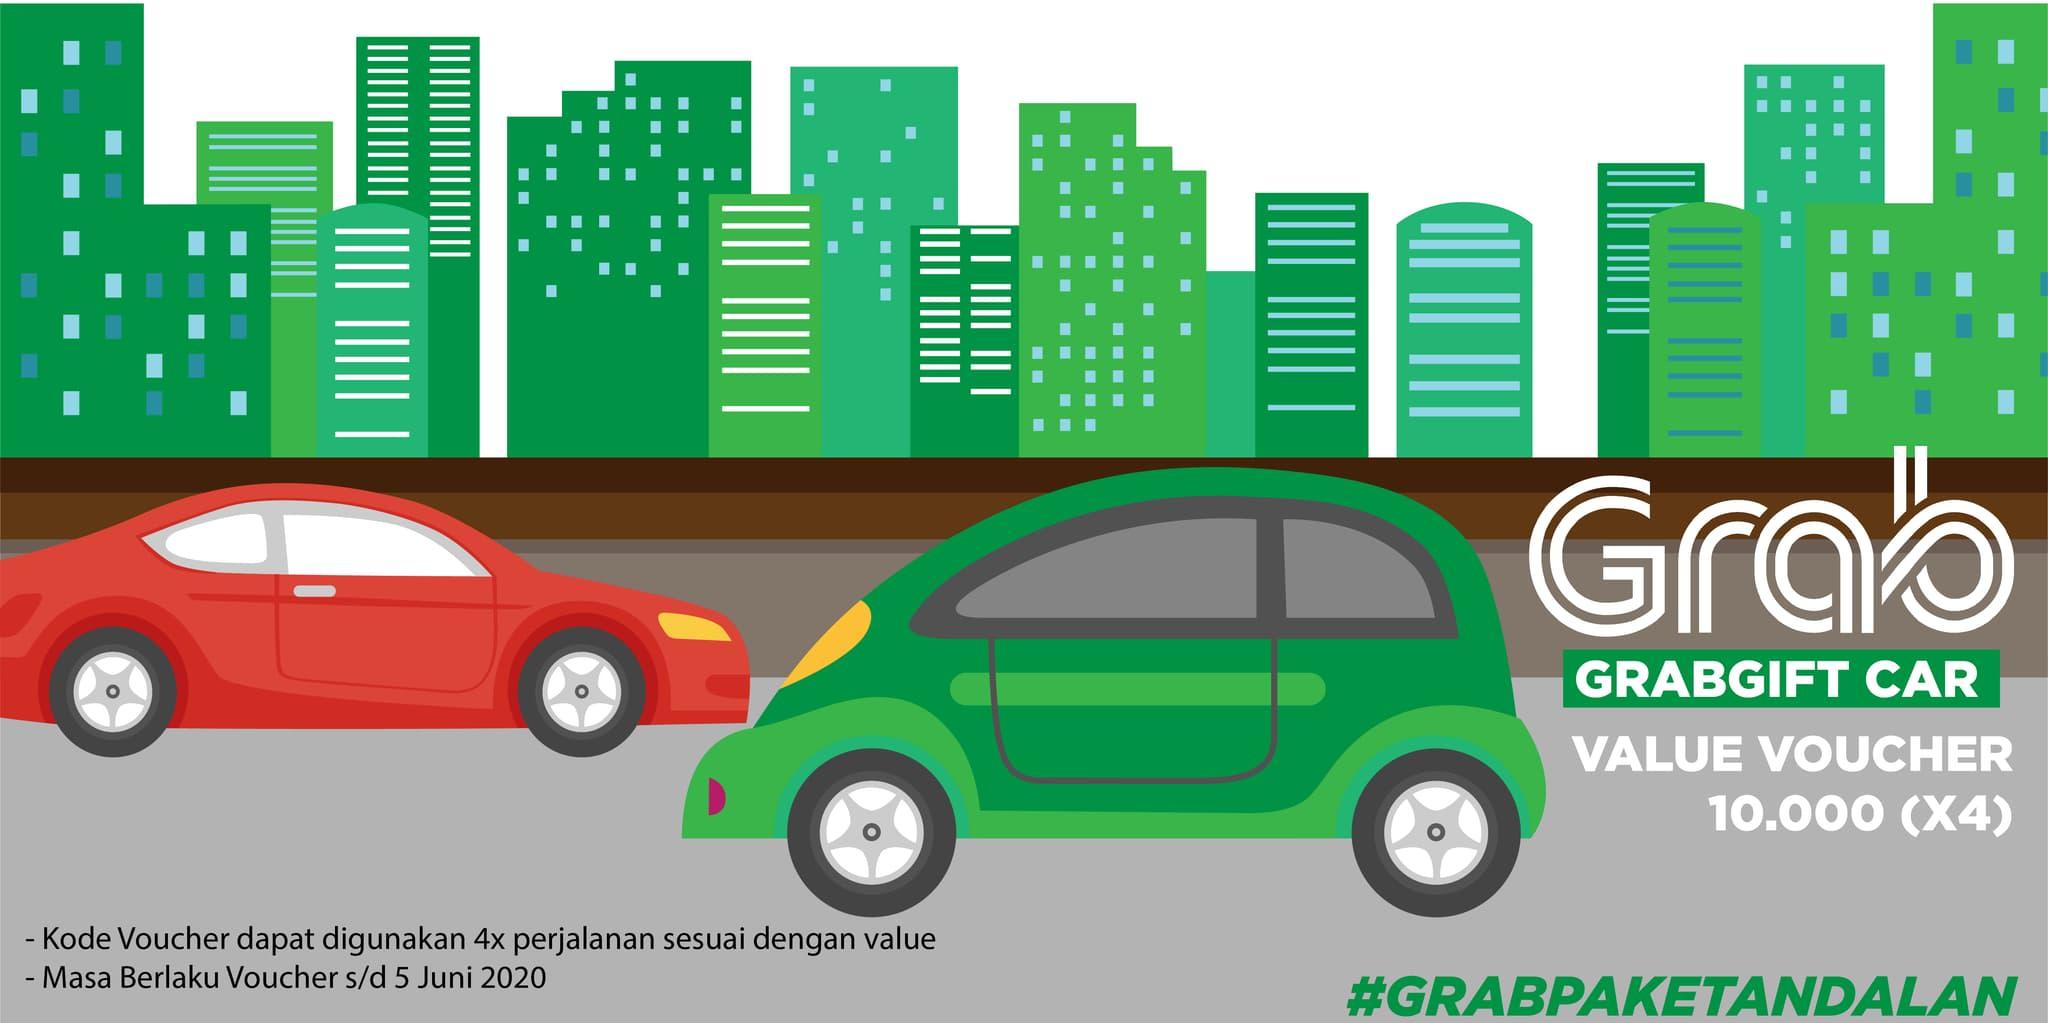 4x Voucher Grab Car Rp 10.000 (khusus Pengguna Aplikasi Grab)